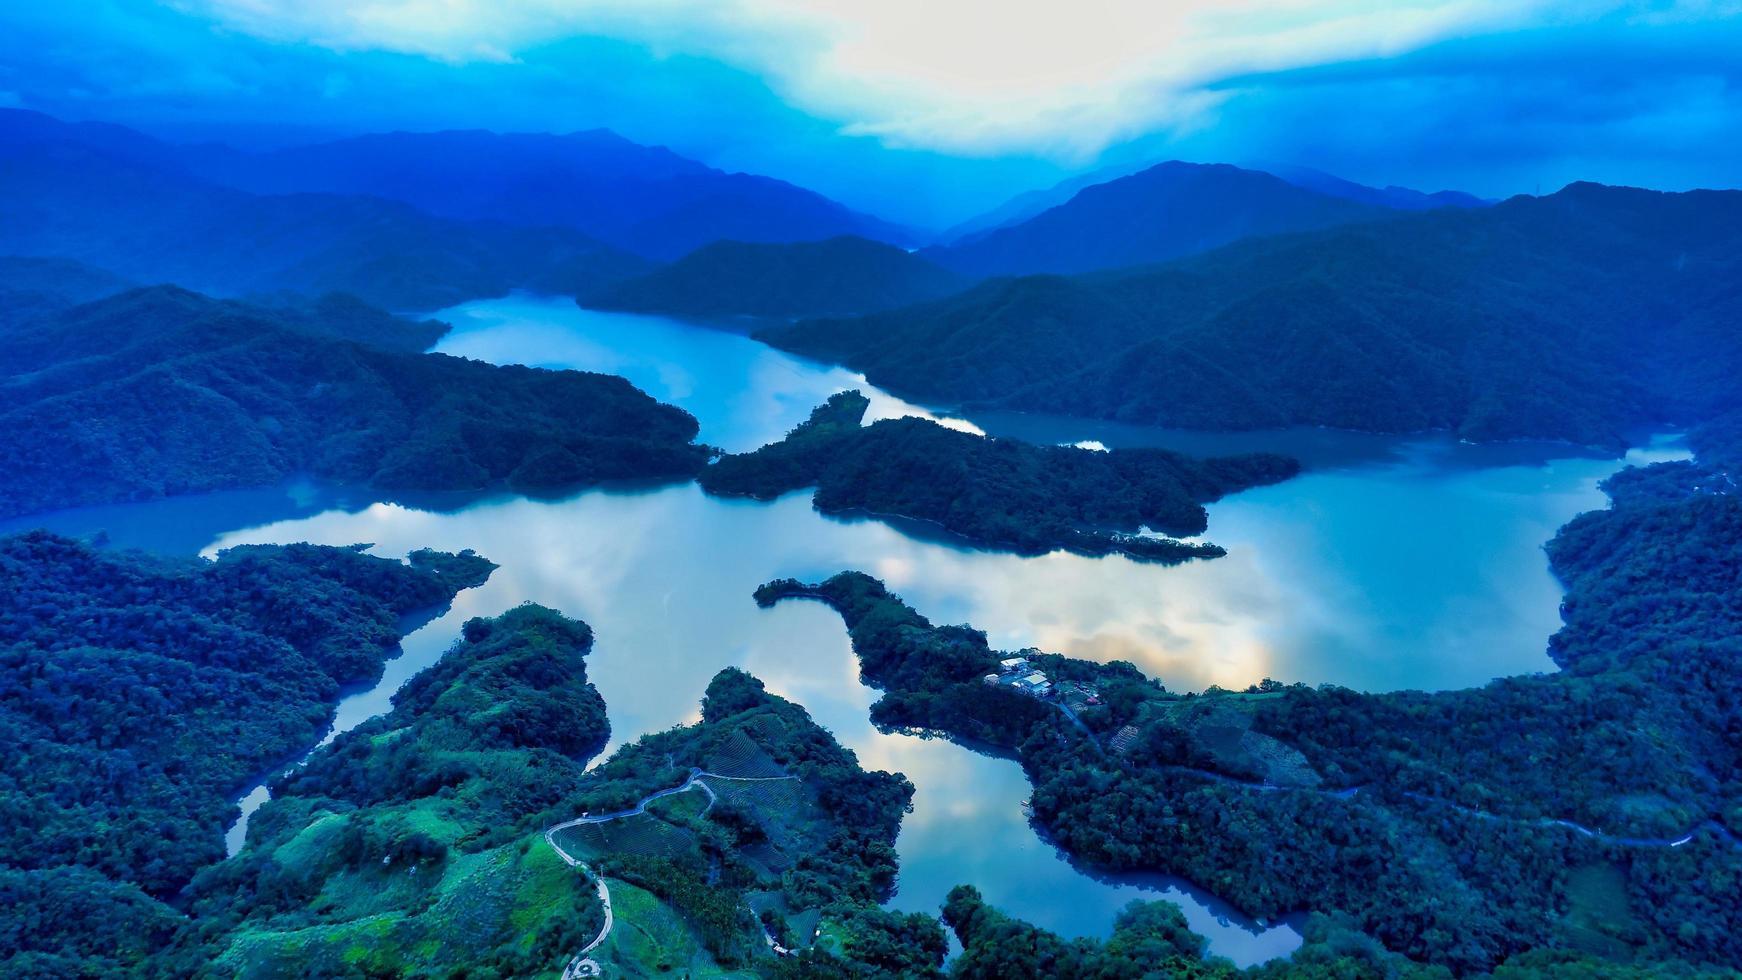 Aerial view of Thousand Island Lake photo